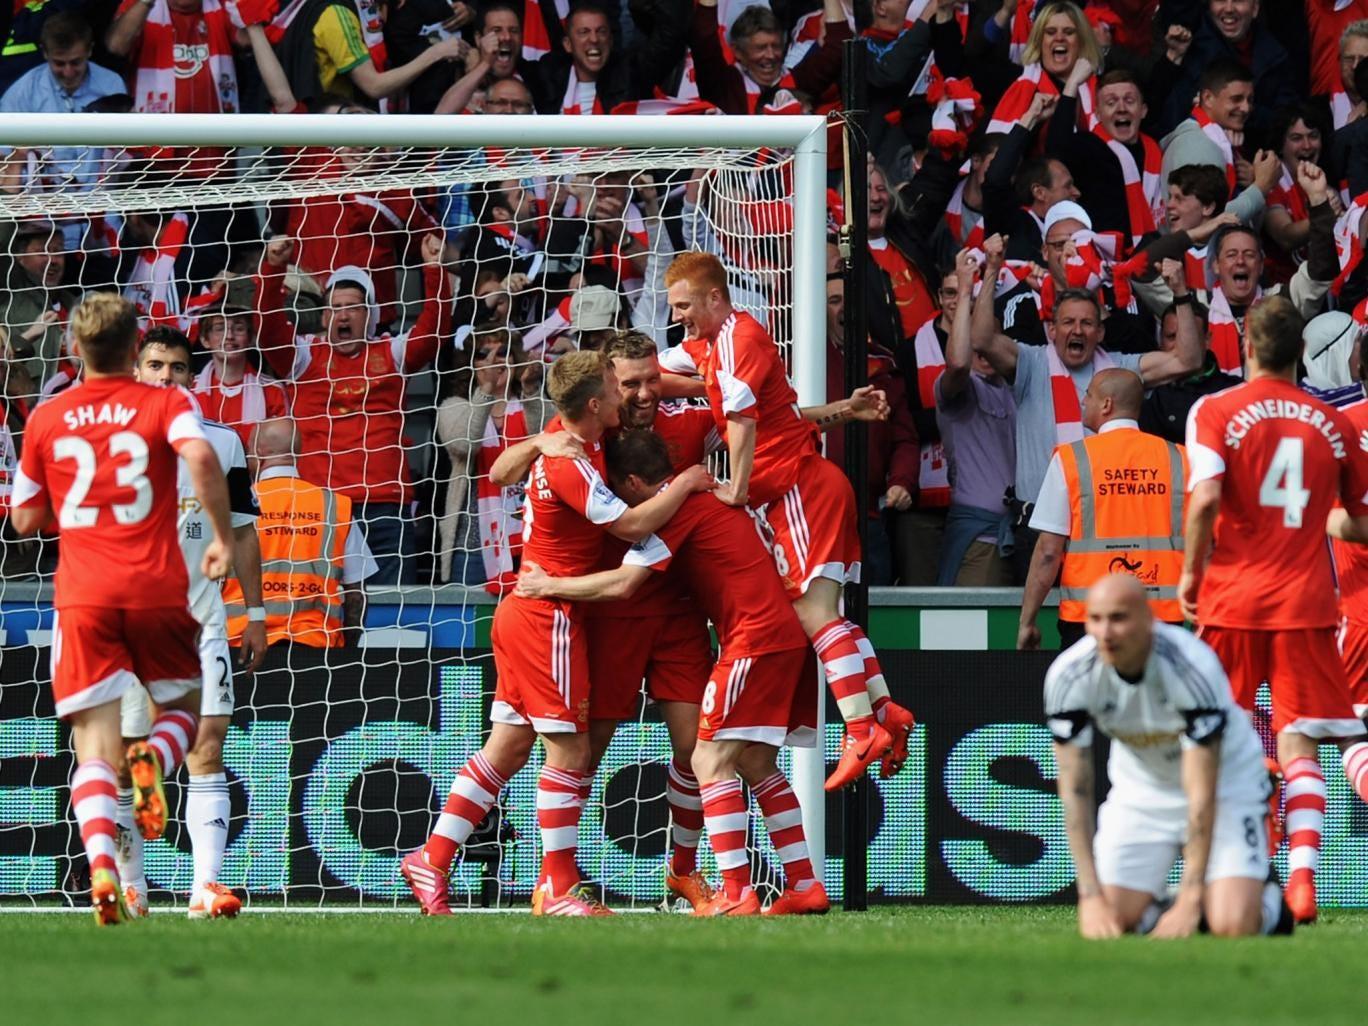 Rickie Lambert celebrates with his teammates after scoring the winning goal